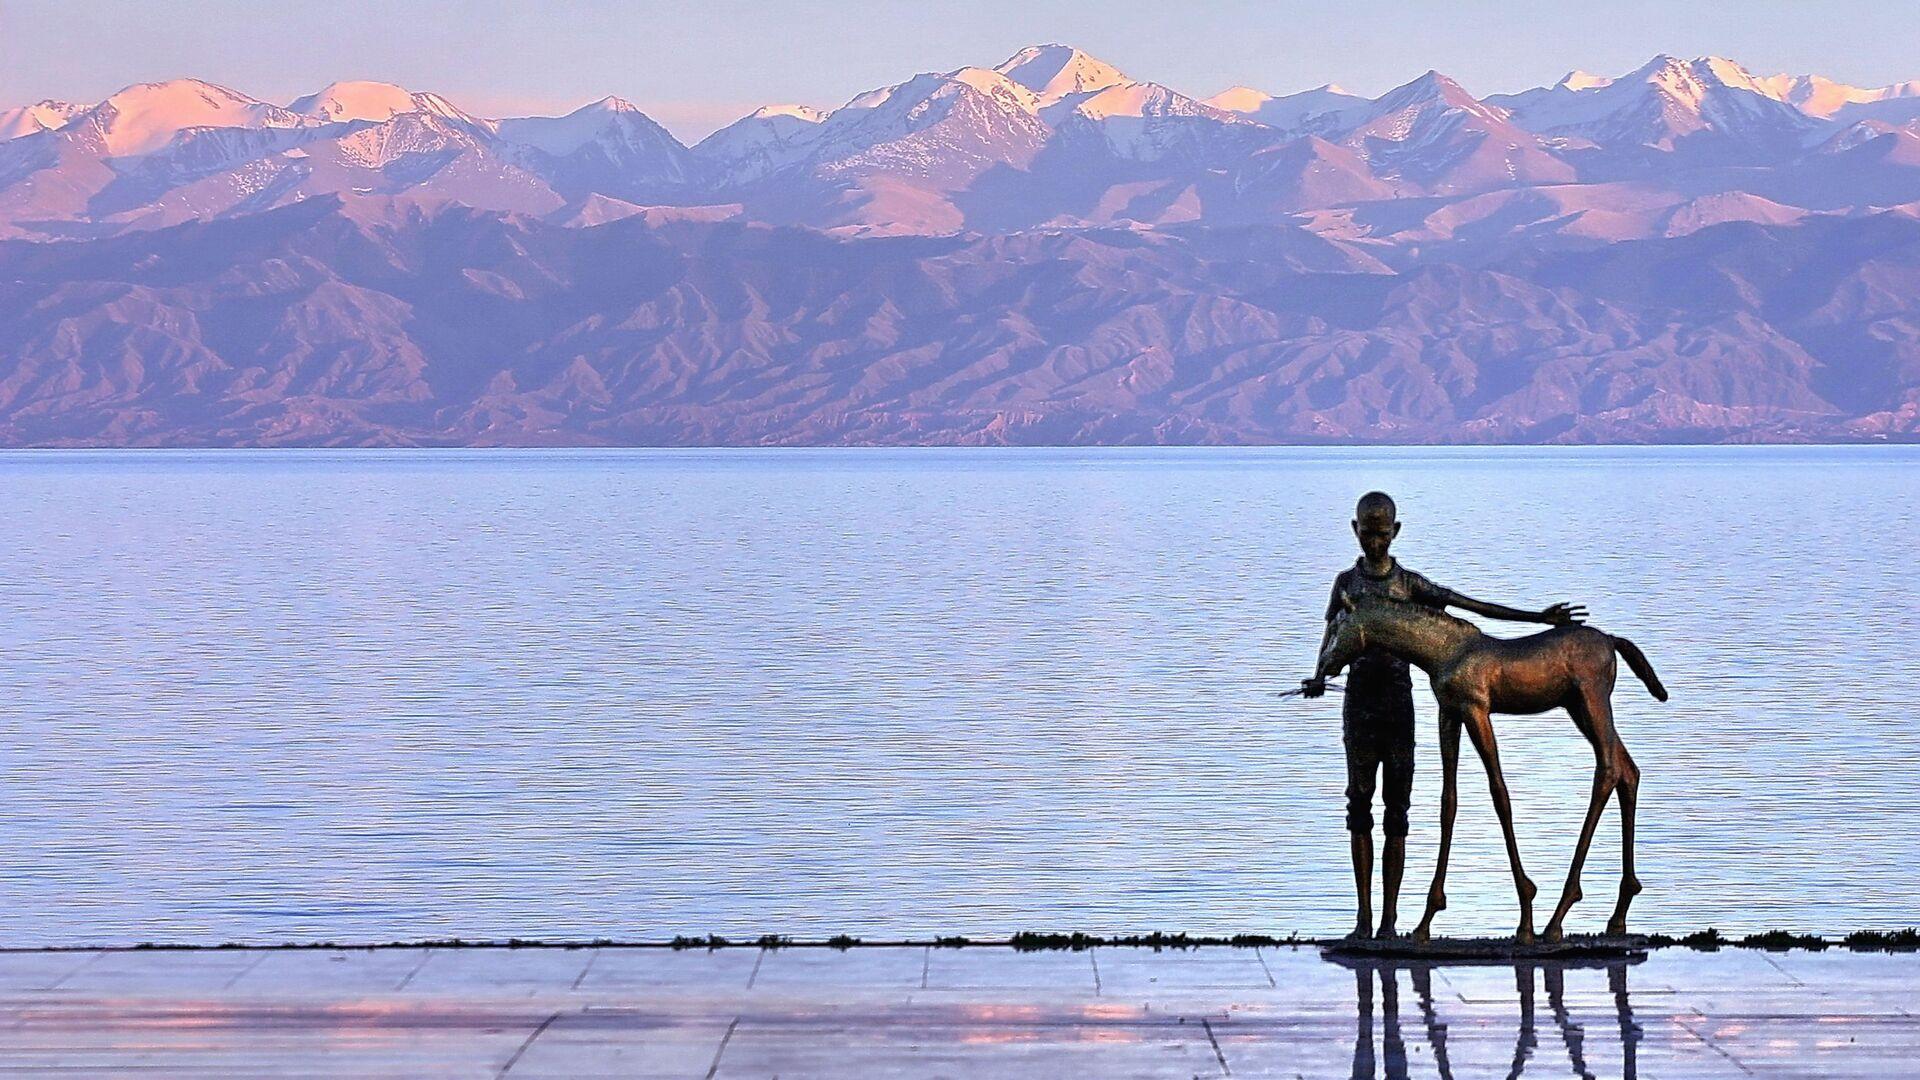 Il lago montano Issyk Kul' in Kyryzstan - Sputnik Italia, 1920, 10.06.2021